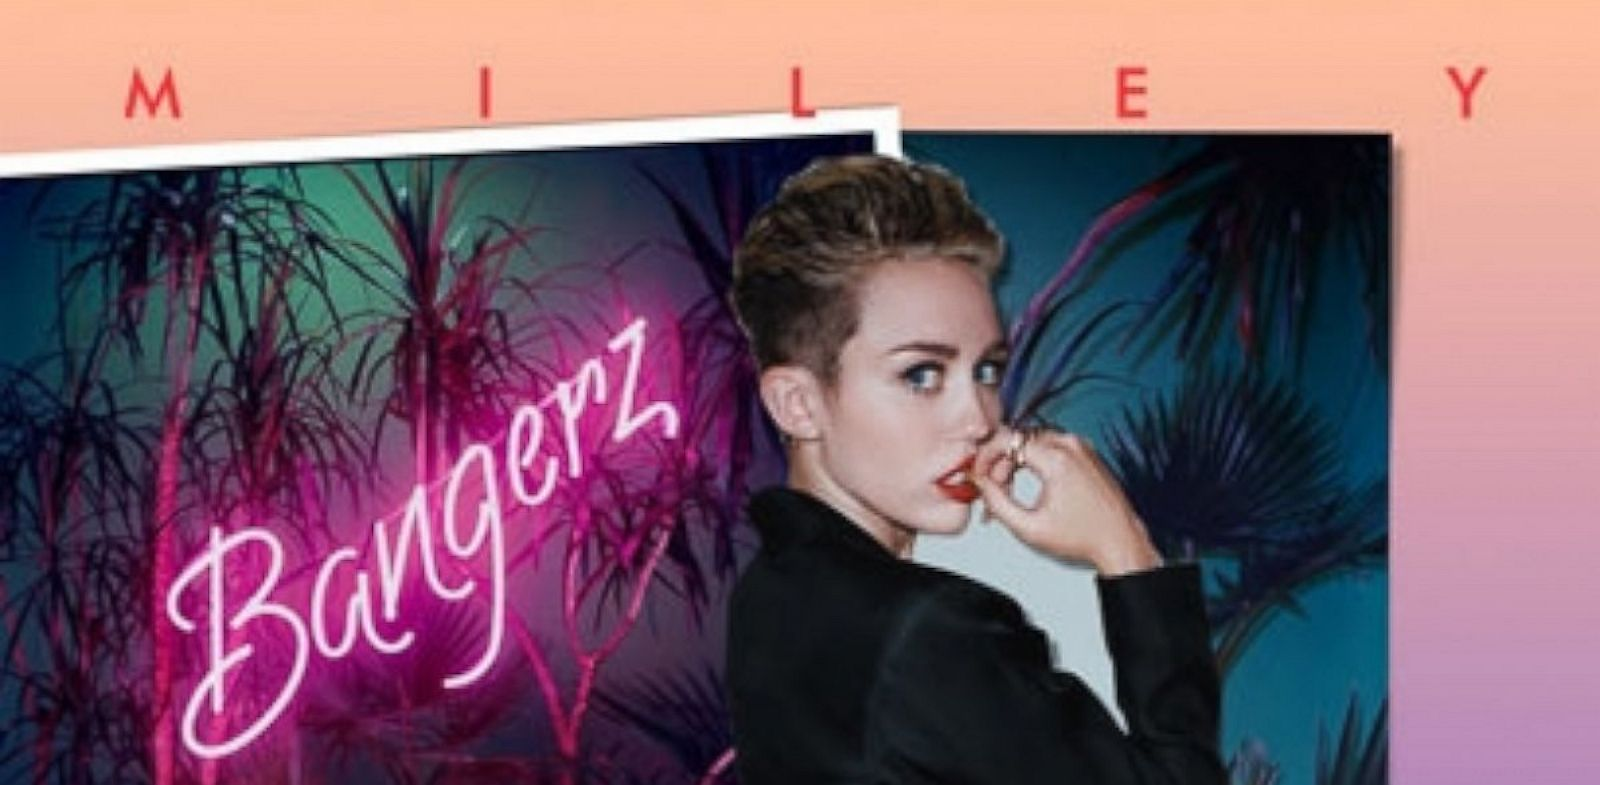 PHOTO: Miley Cyrus Bangerz album cover